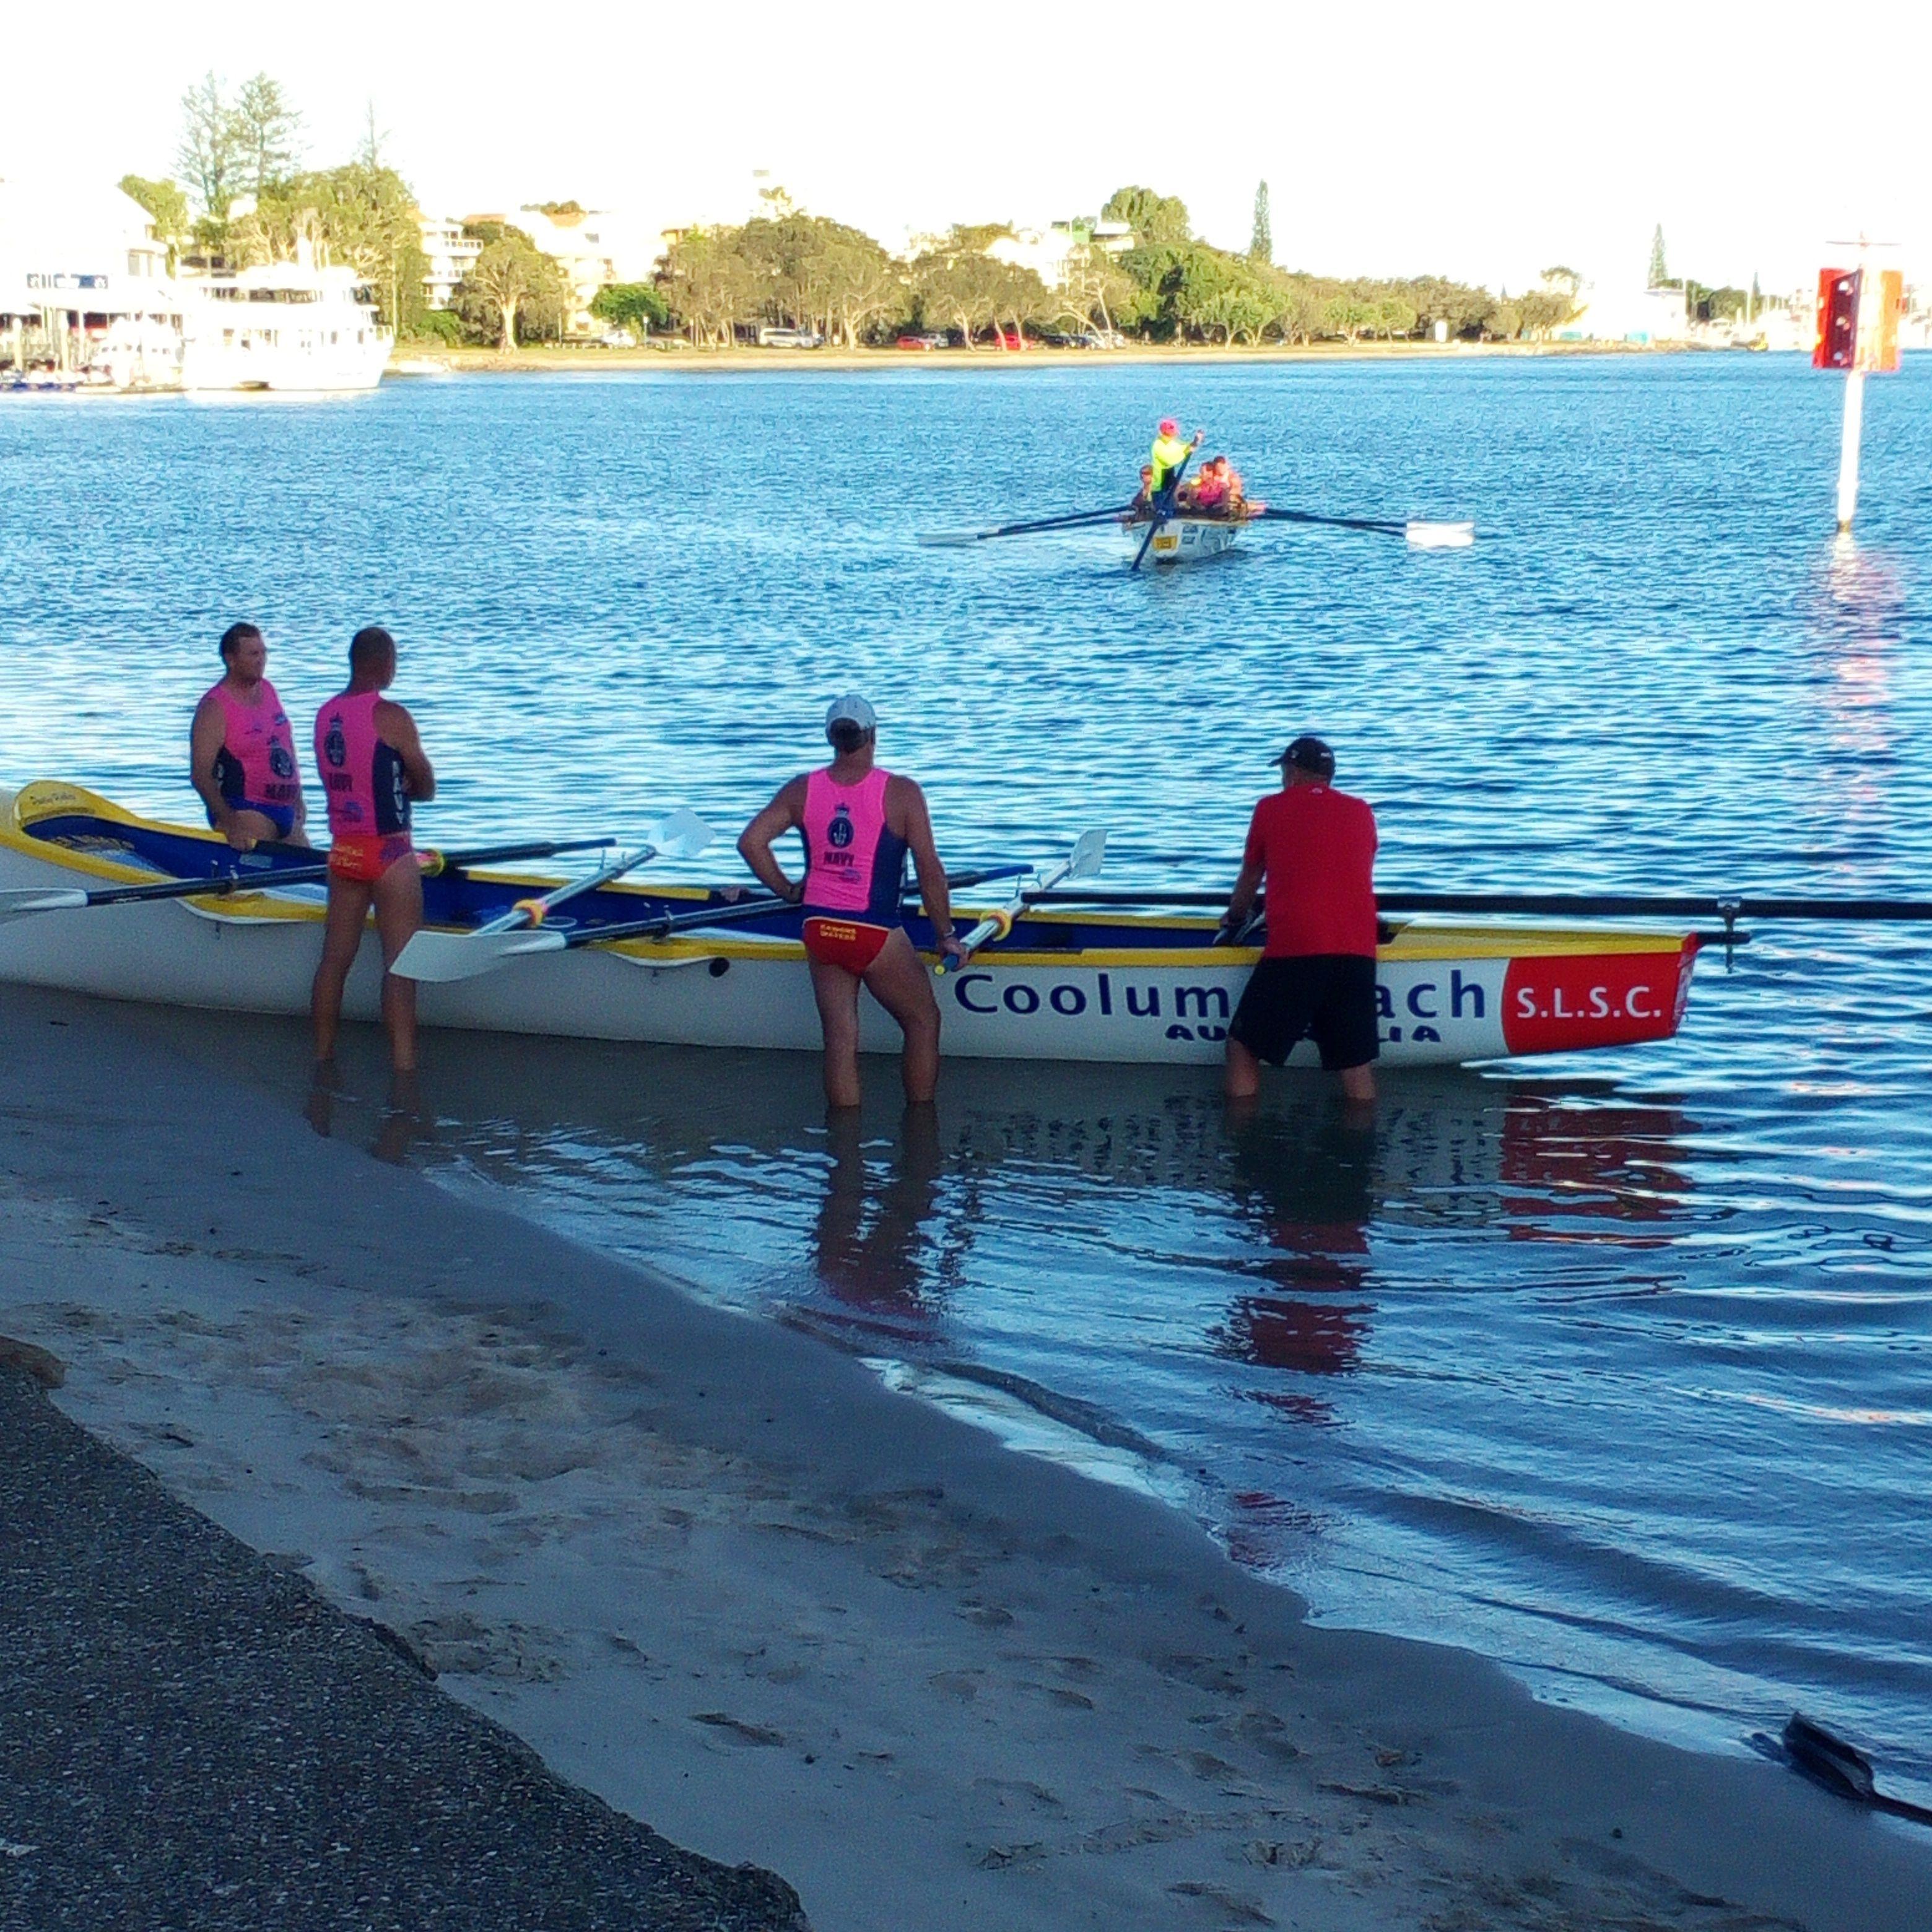 Surf Life Savers Train Year Round On Mooloolaba Water Ways